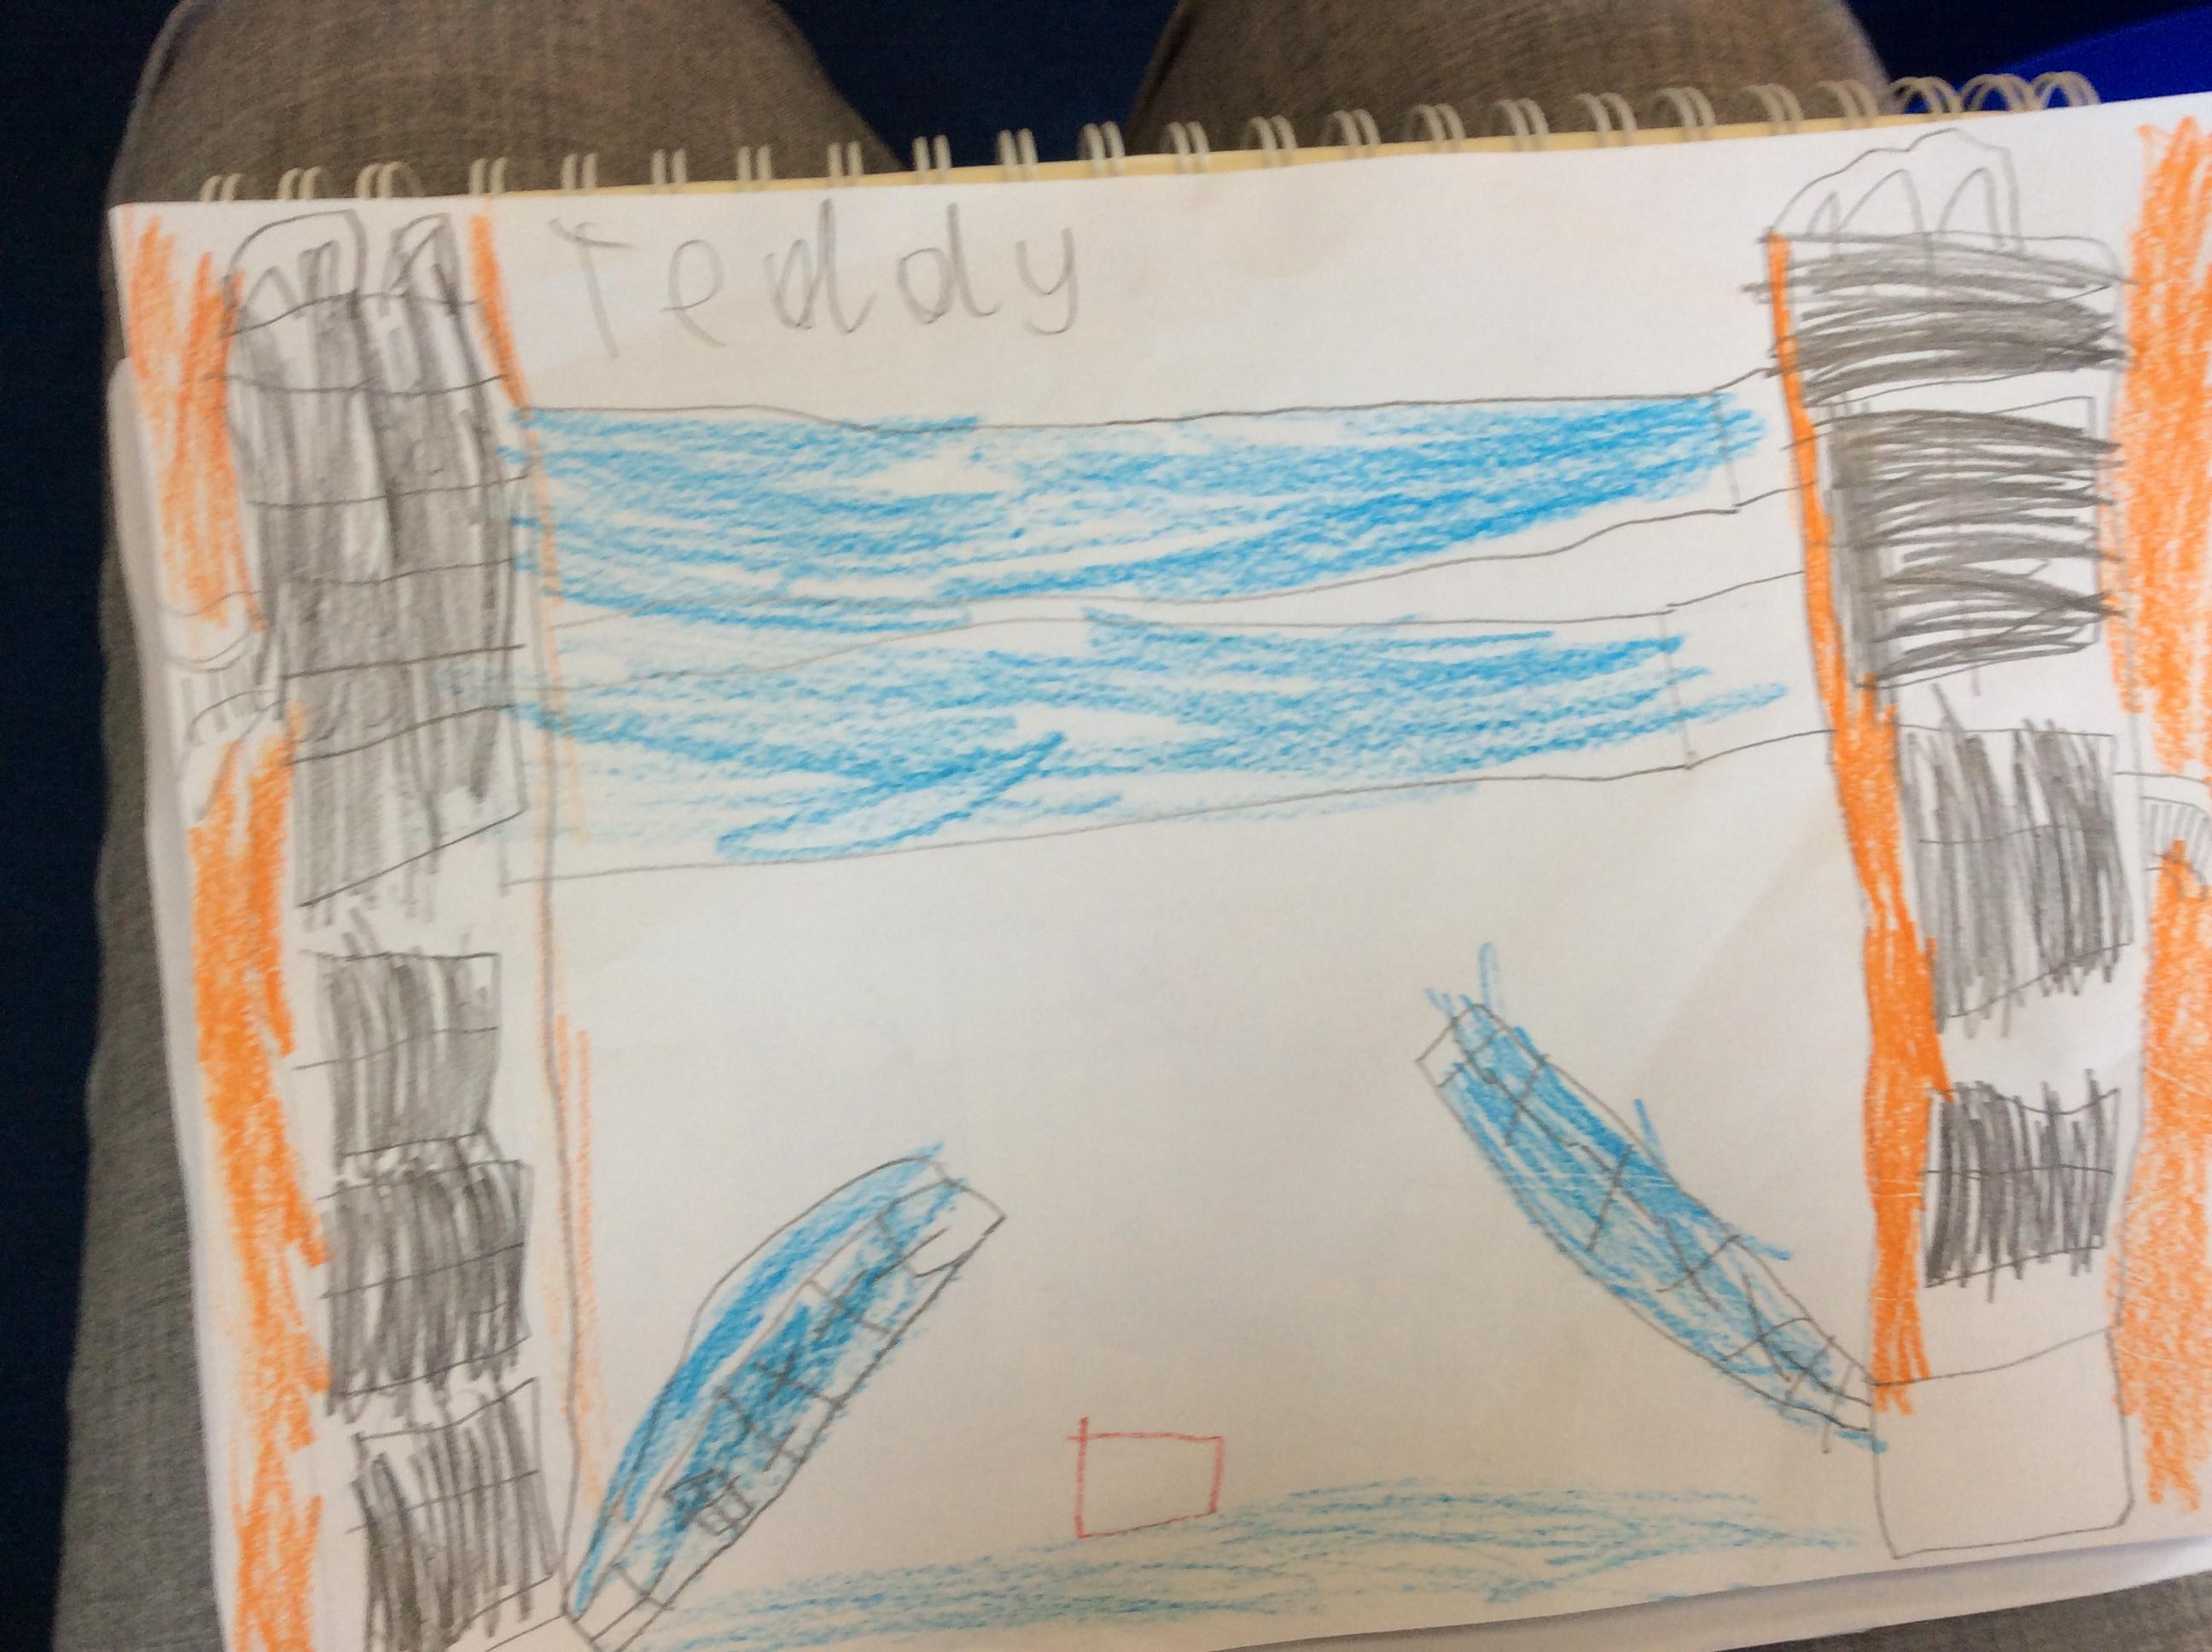 Teddy's brilliant art!